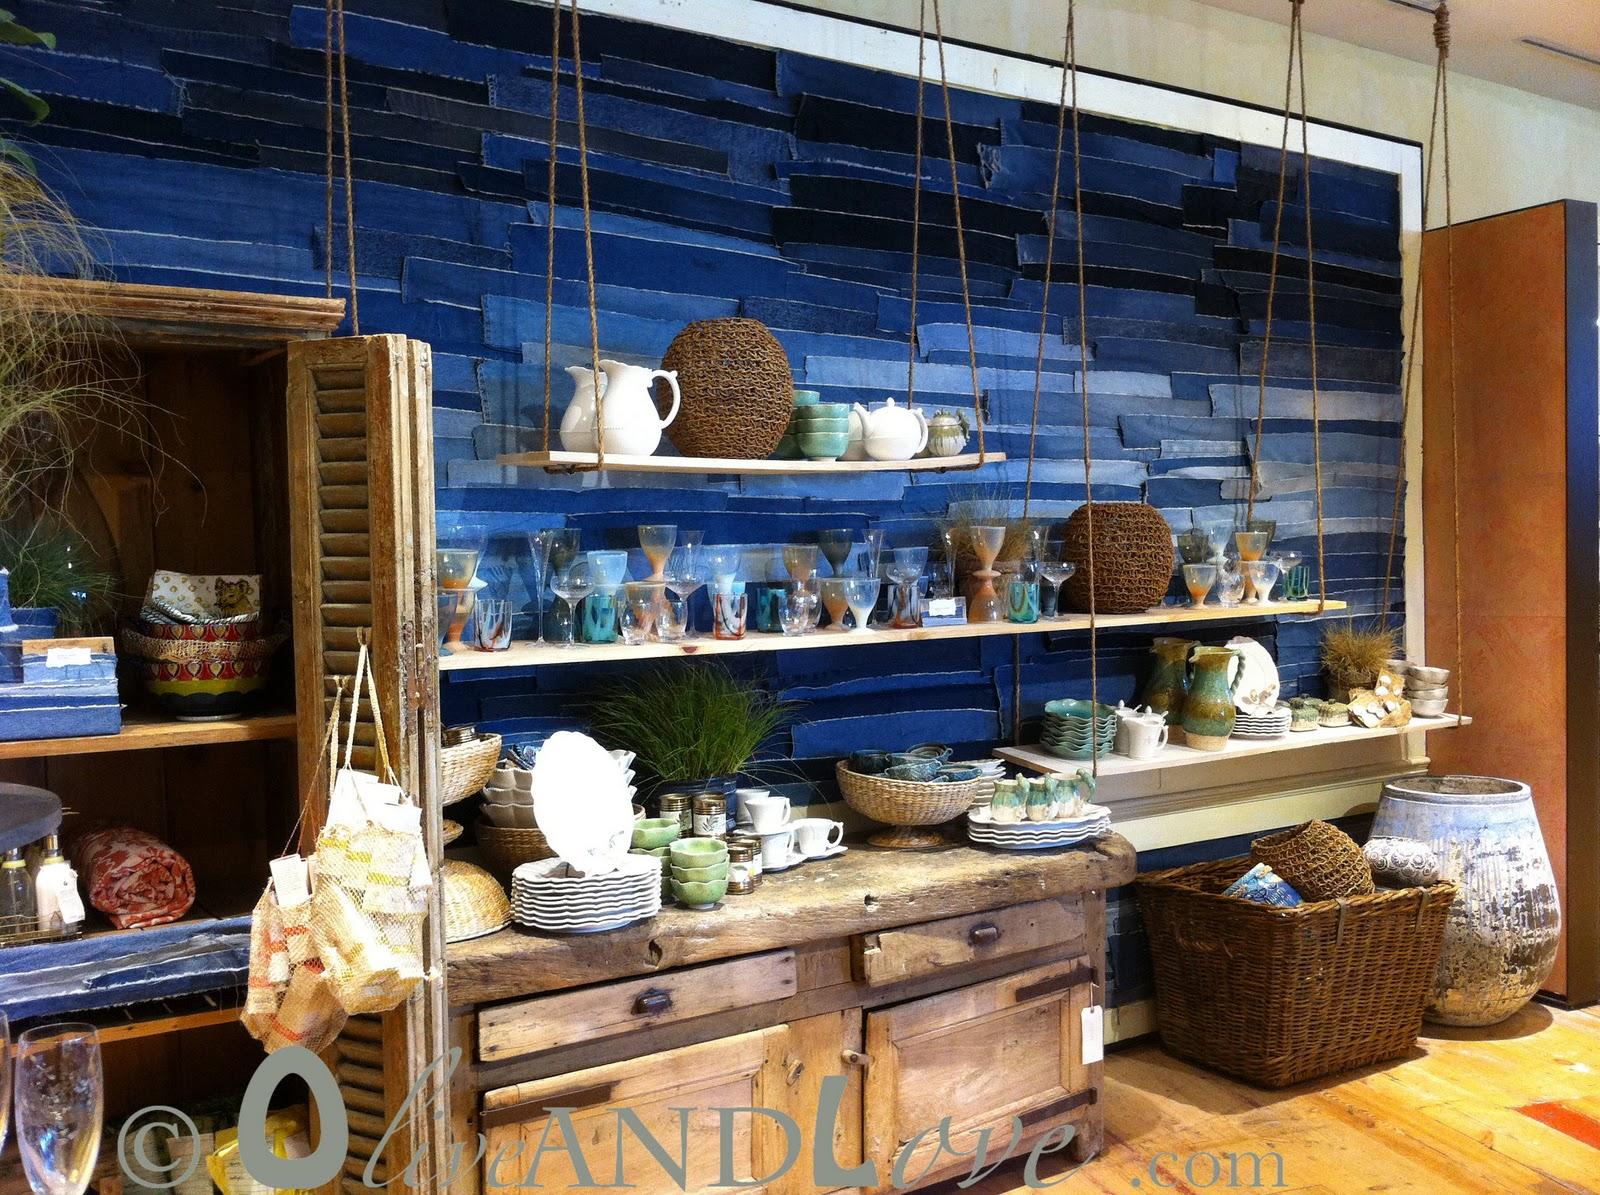 Anthropologie Display Oliveandlove